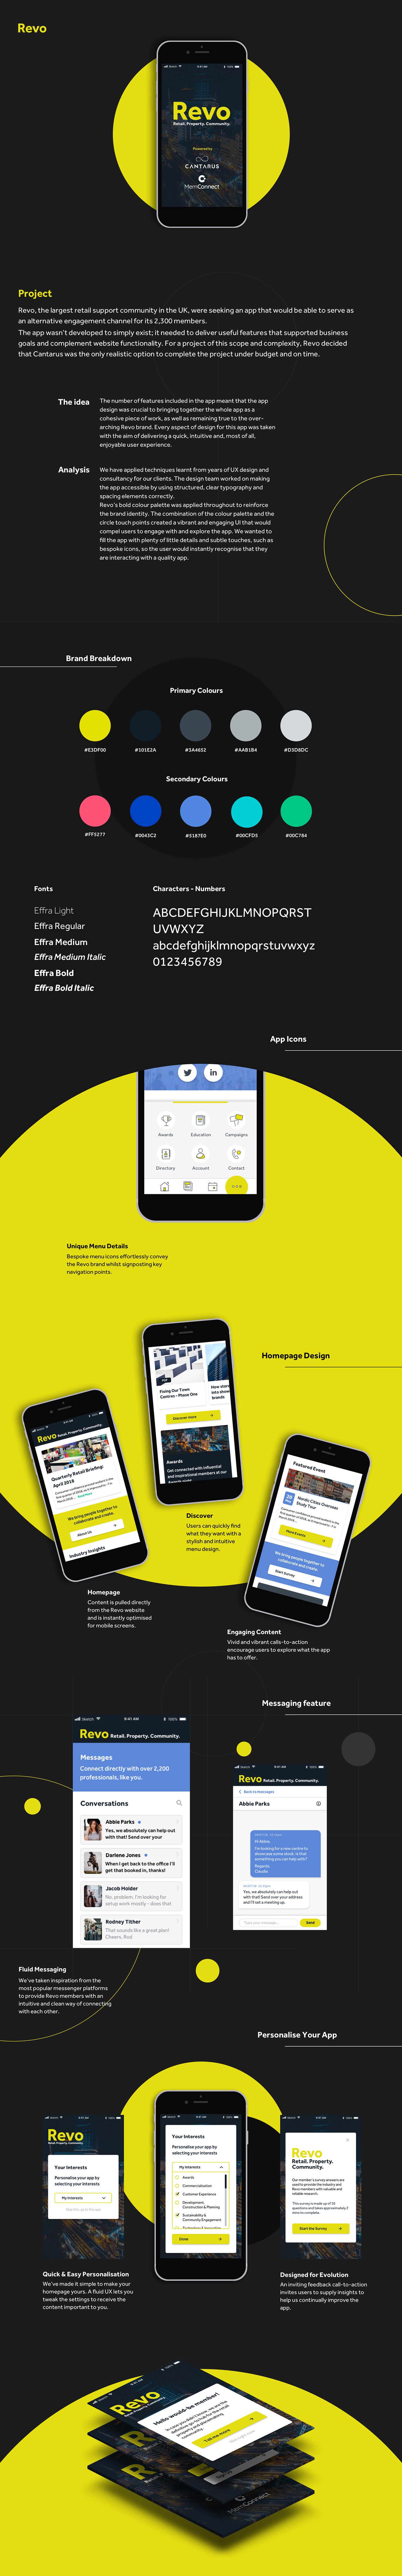 app design community engagement Streamline ux UI